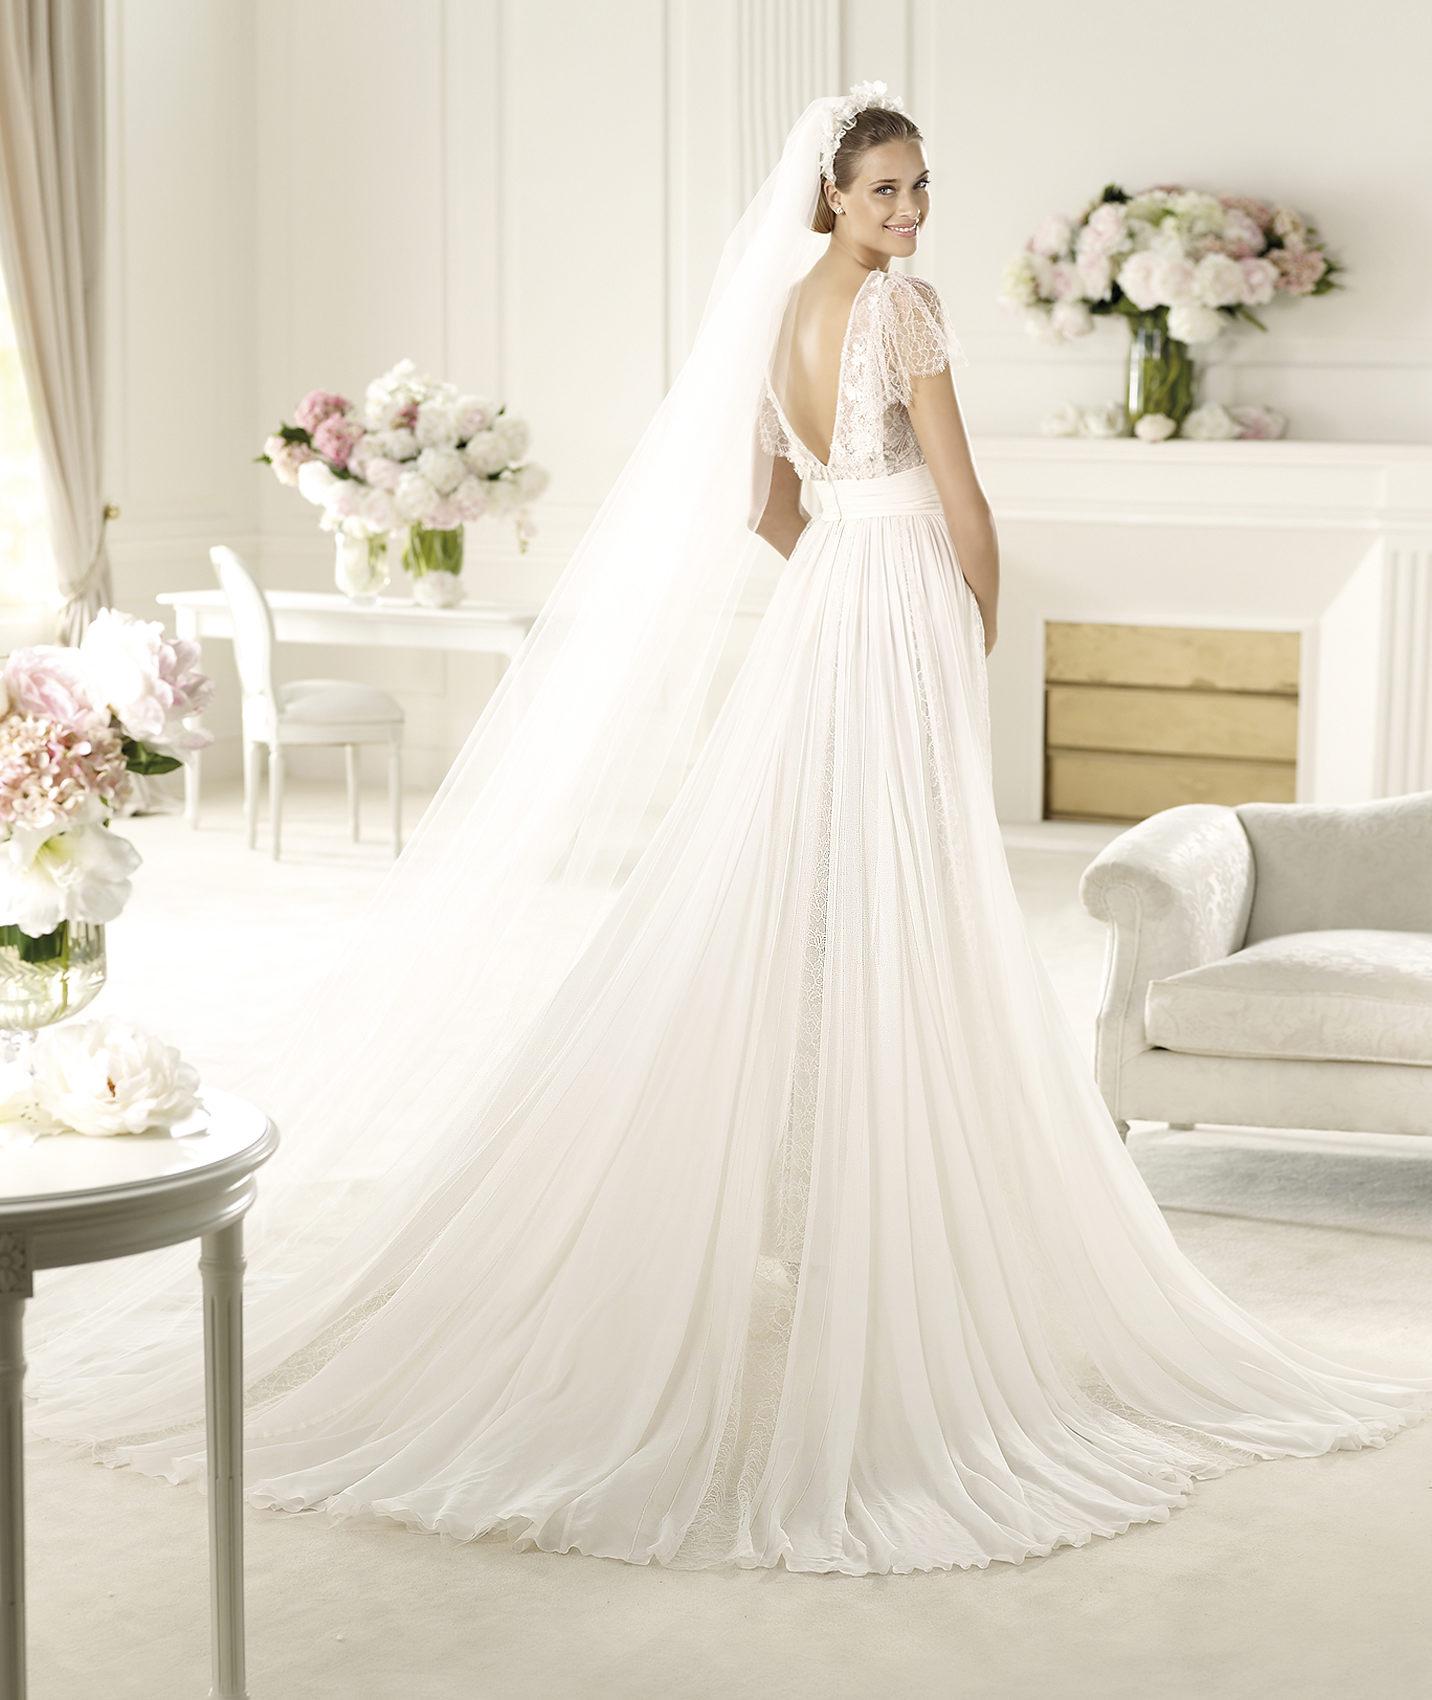 2013 elie saab wedding dress lorraine for Elie saab wedding dress for sale